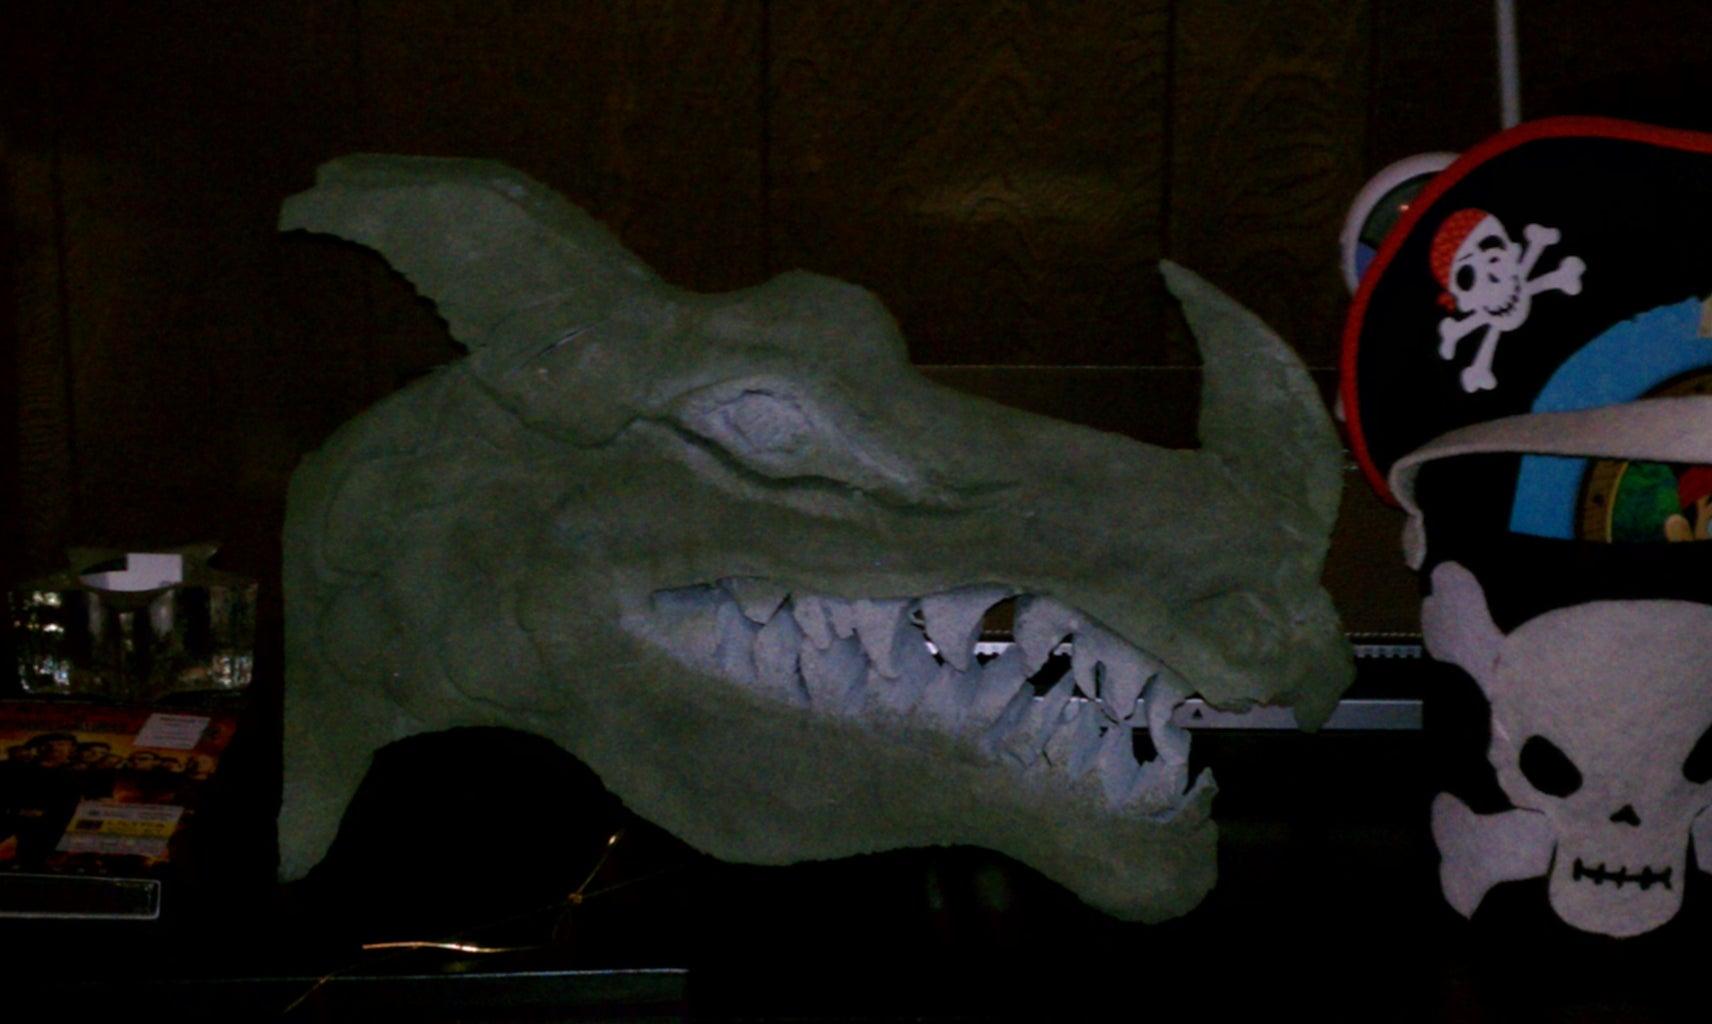 Carving Te Dragon's Head